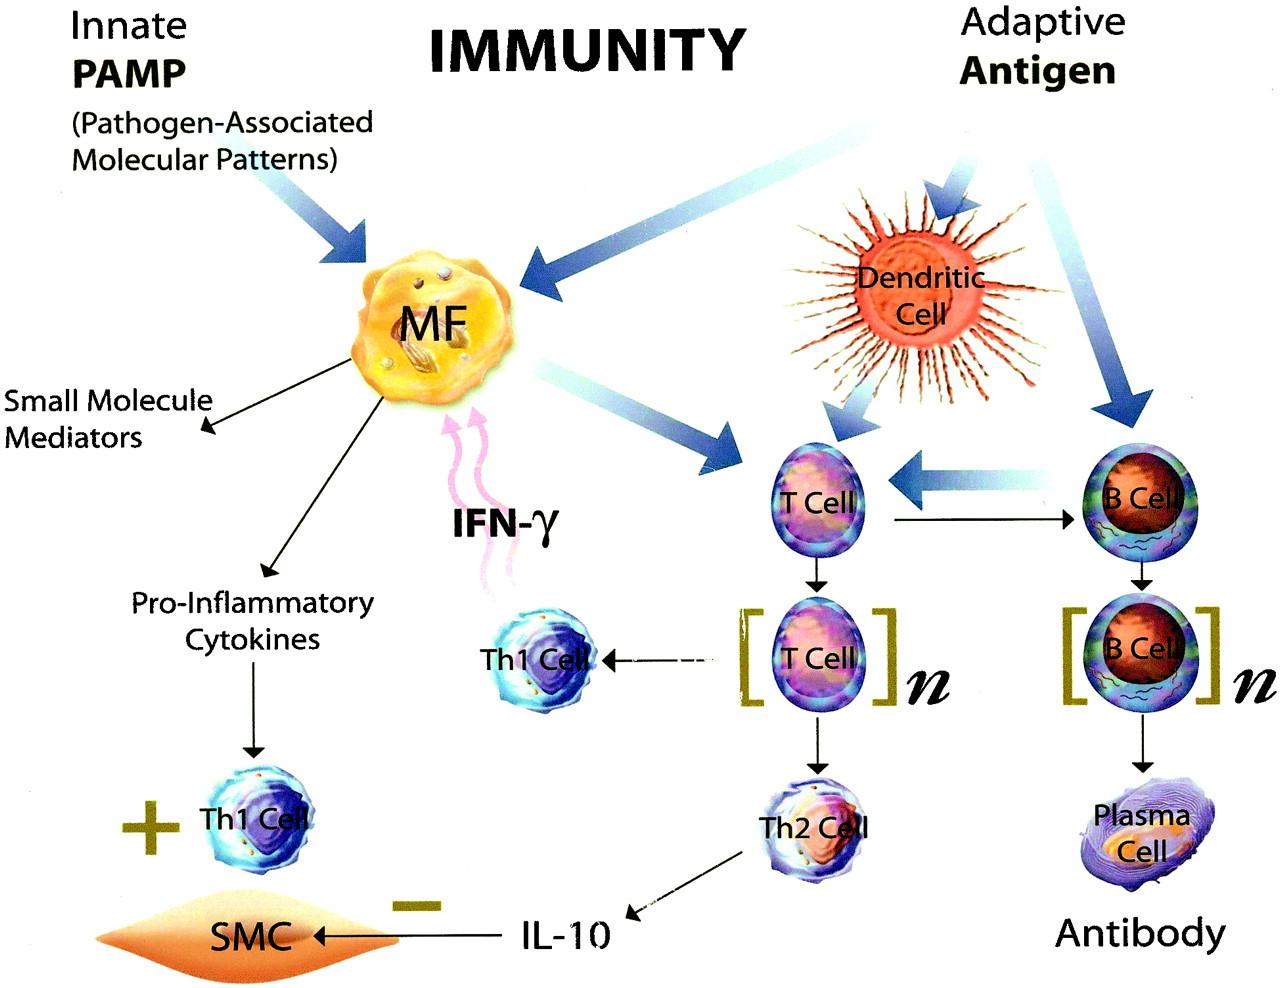 Innate And Adaptive Immunity In The Pathogenesis Of